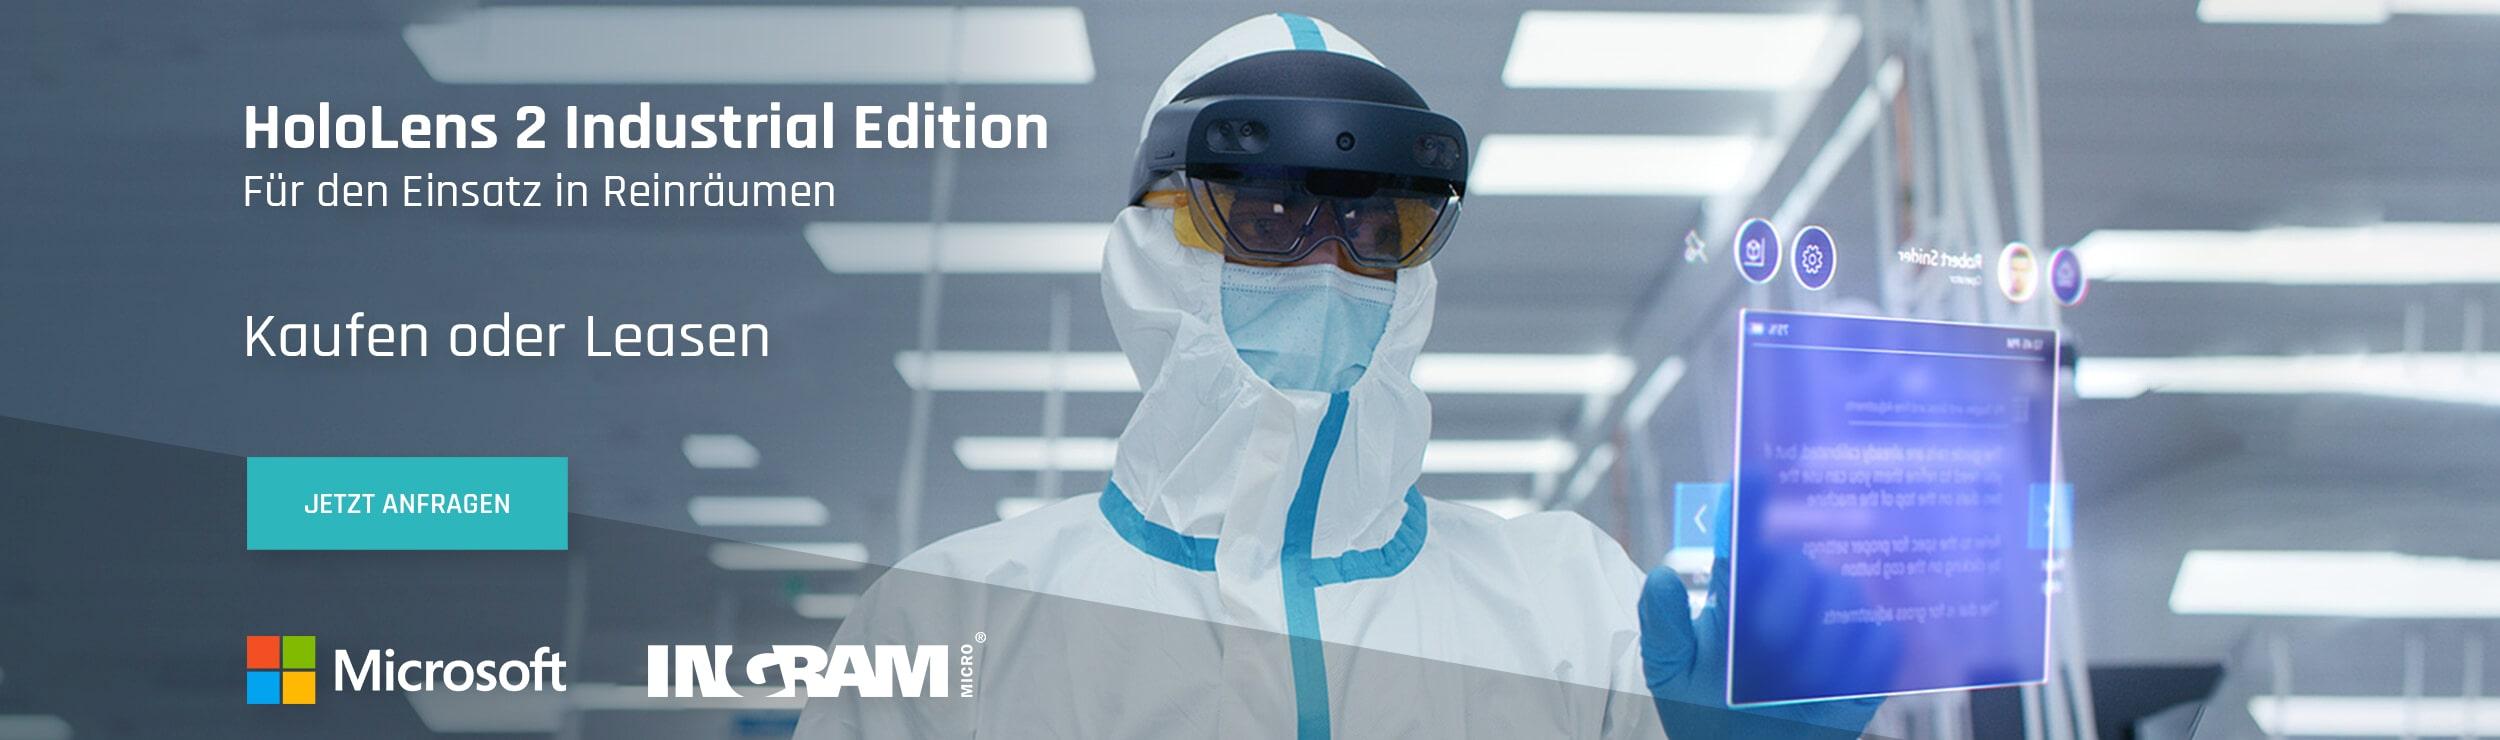 Microsoft HoloLens 2 Industrial Edition